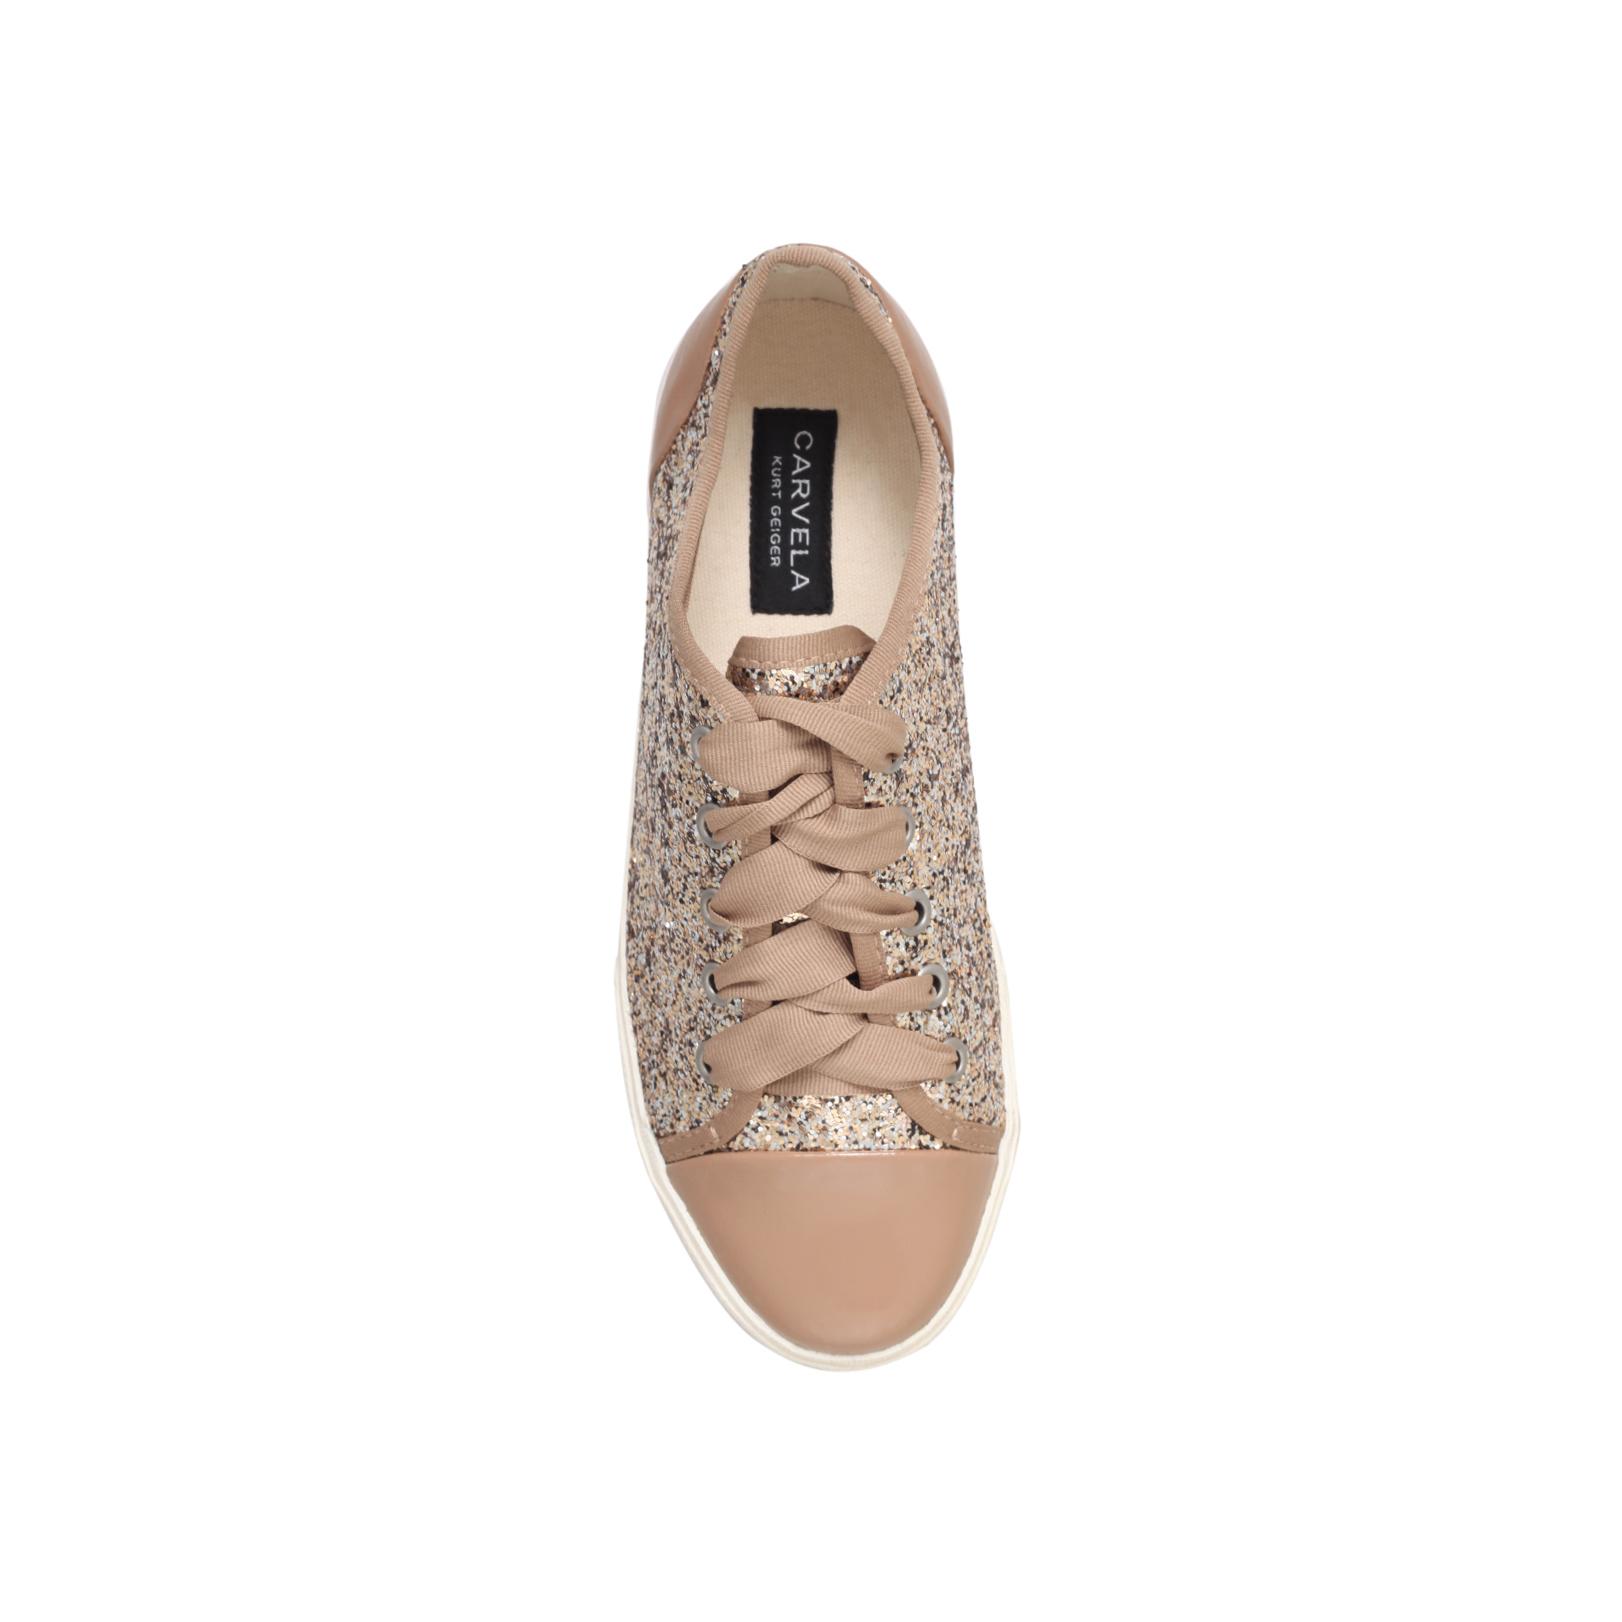 17237a9b6f JASPER Carvela Jasper Gold Flat Sneakers by CARVELA